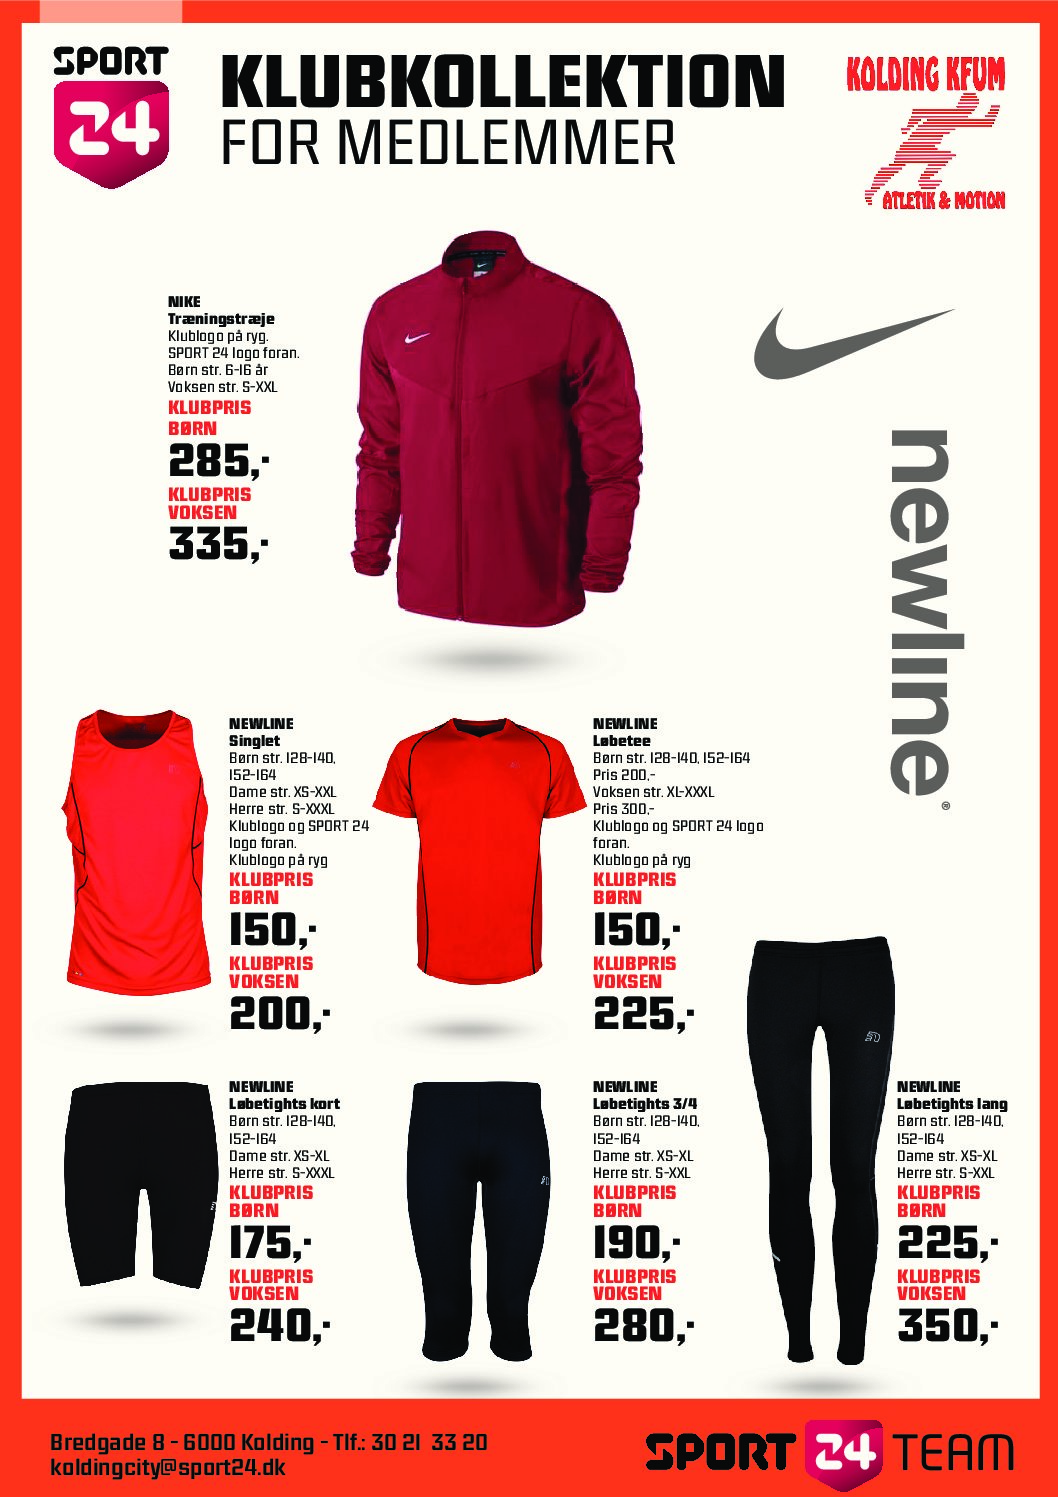 Klubtøj hos Sport 24 i Kolding